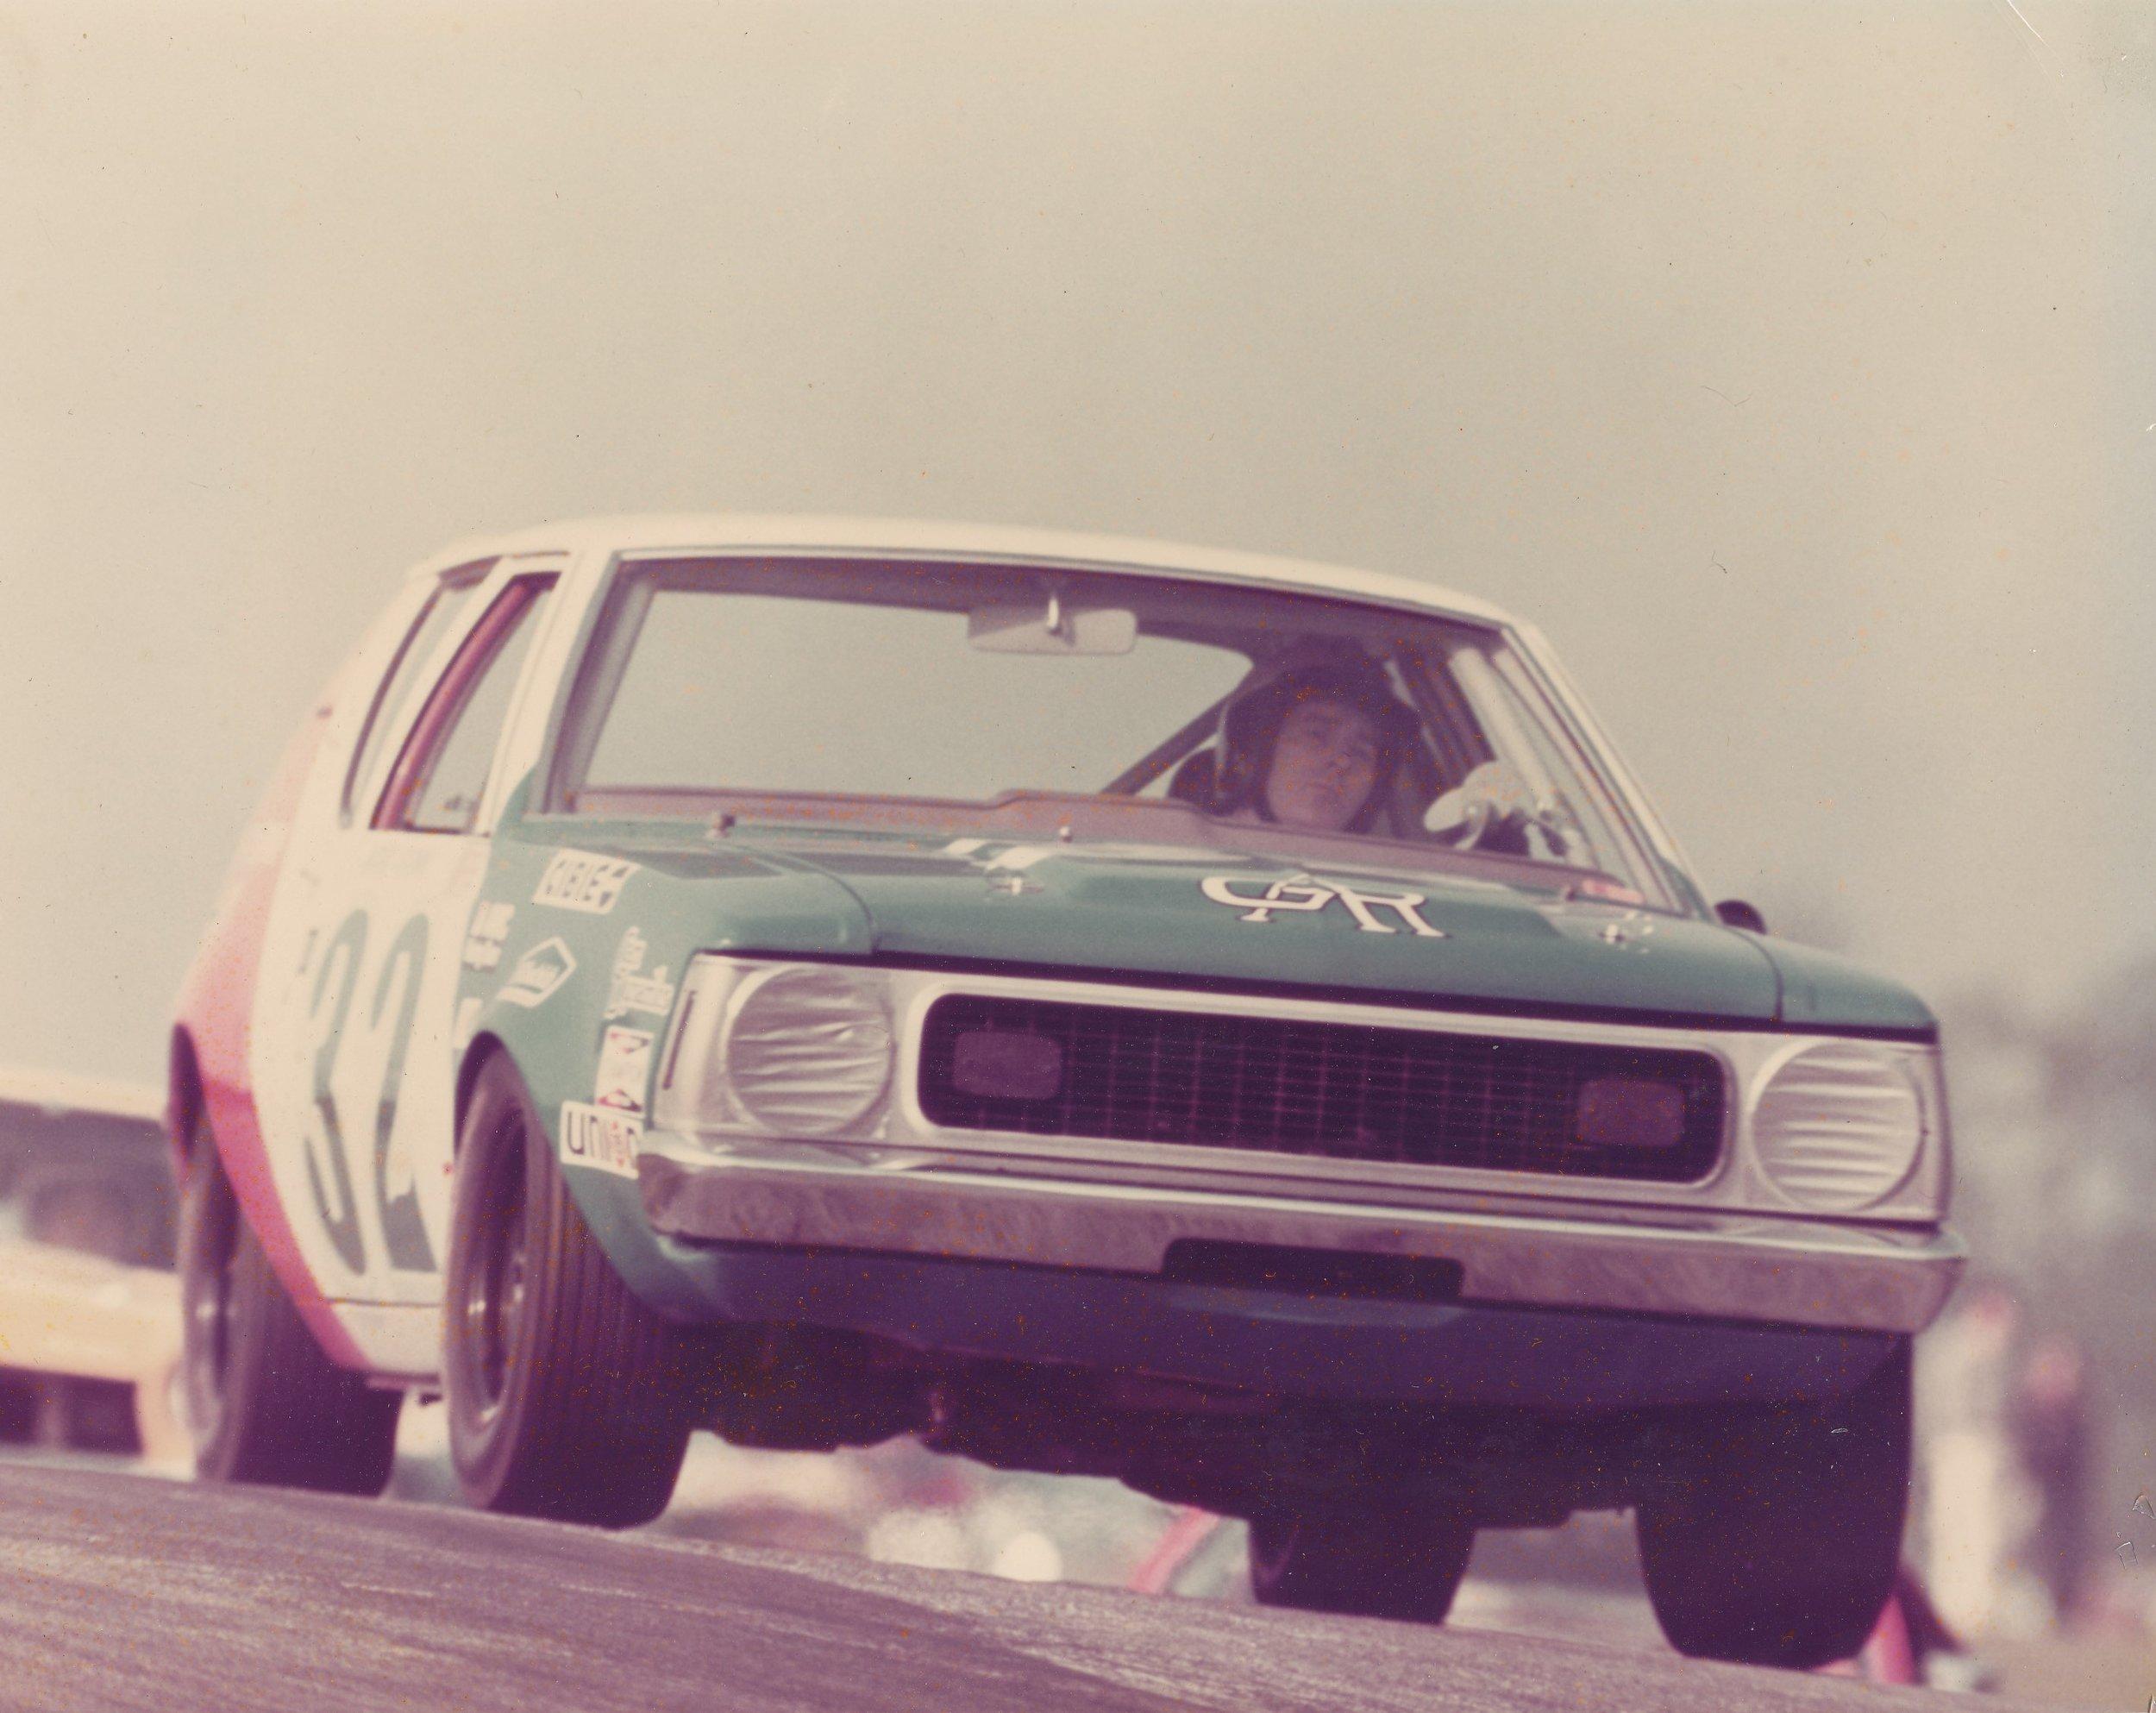 AMC Gremlin IMSA RS series (1974)